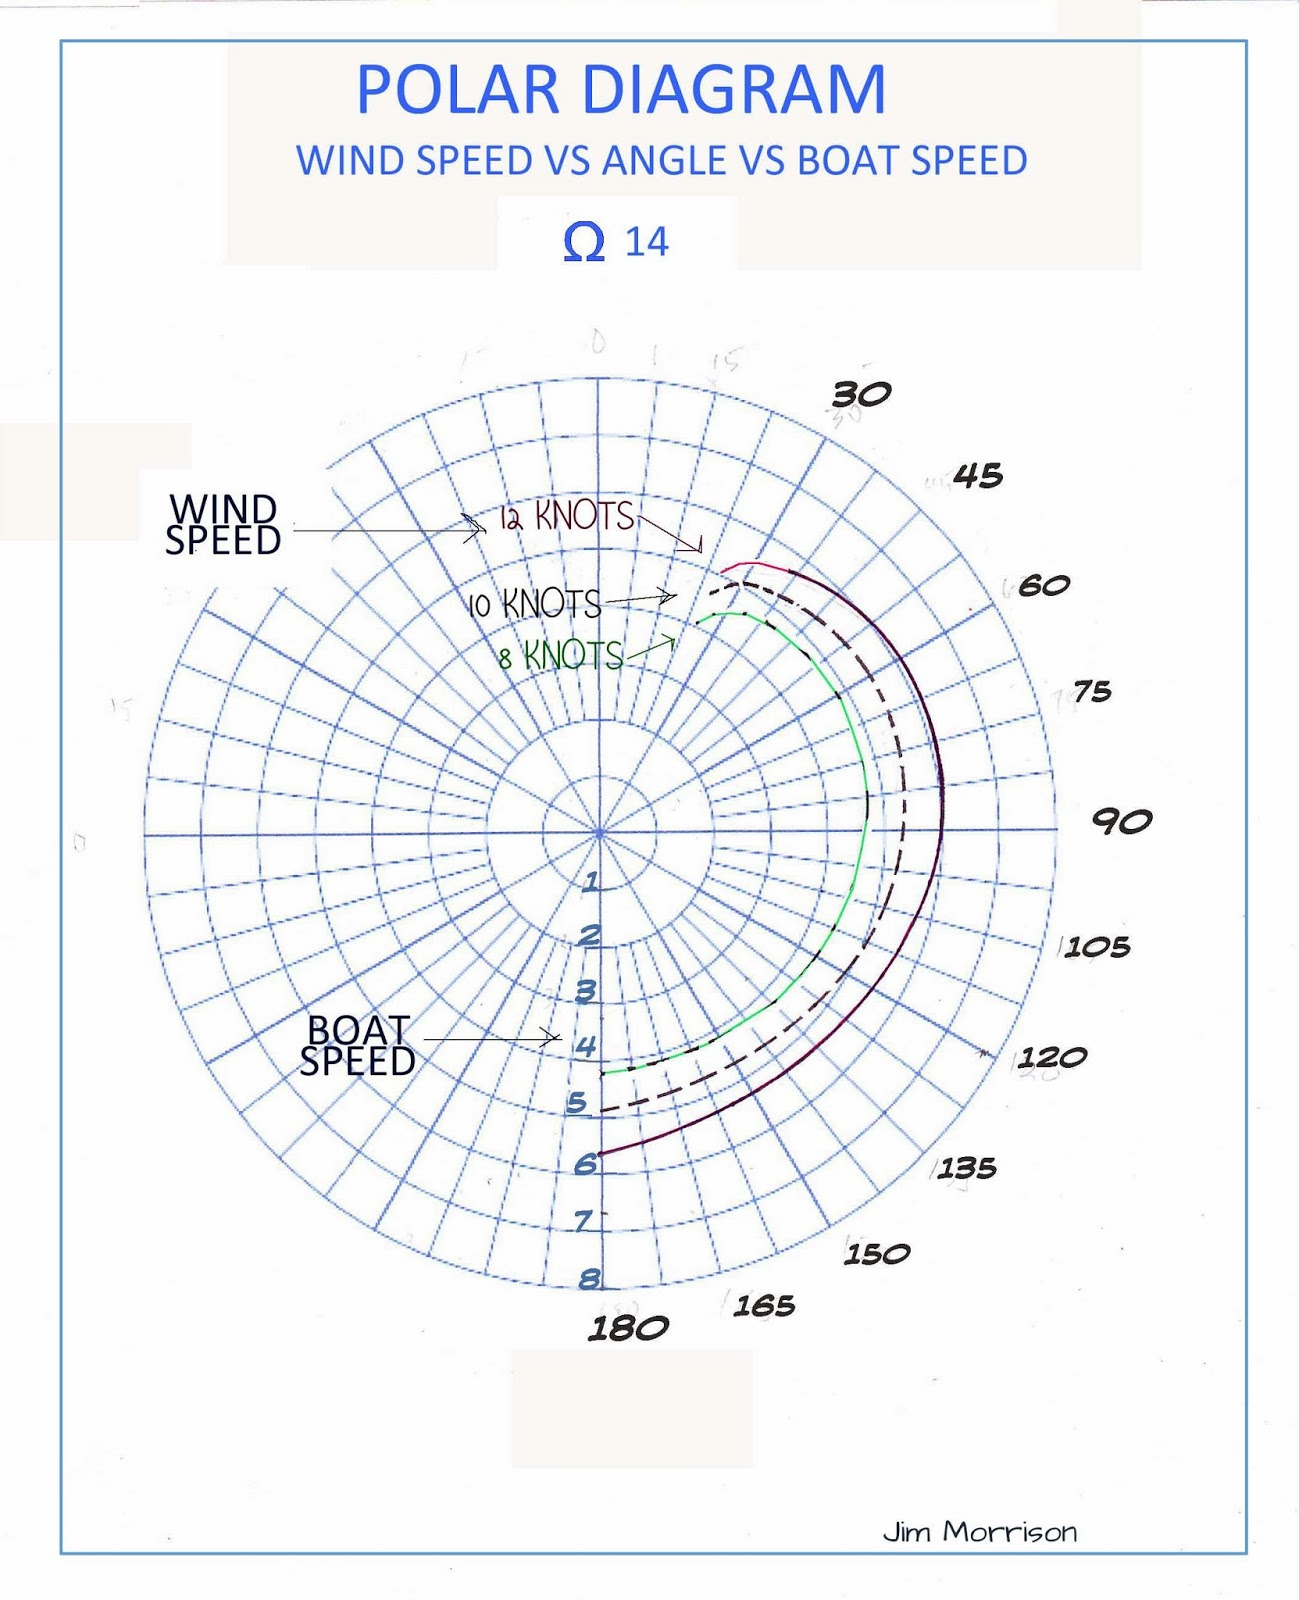 wind energy diagram wind speed diagram omega 14 sailboat: omega 14 polar diagram for wind speed ... #1